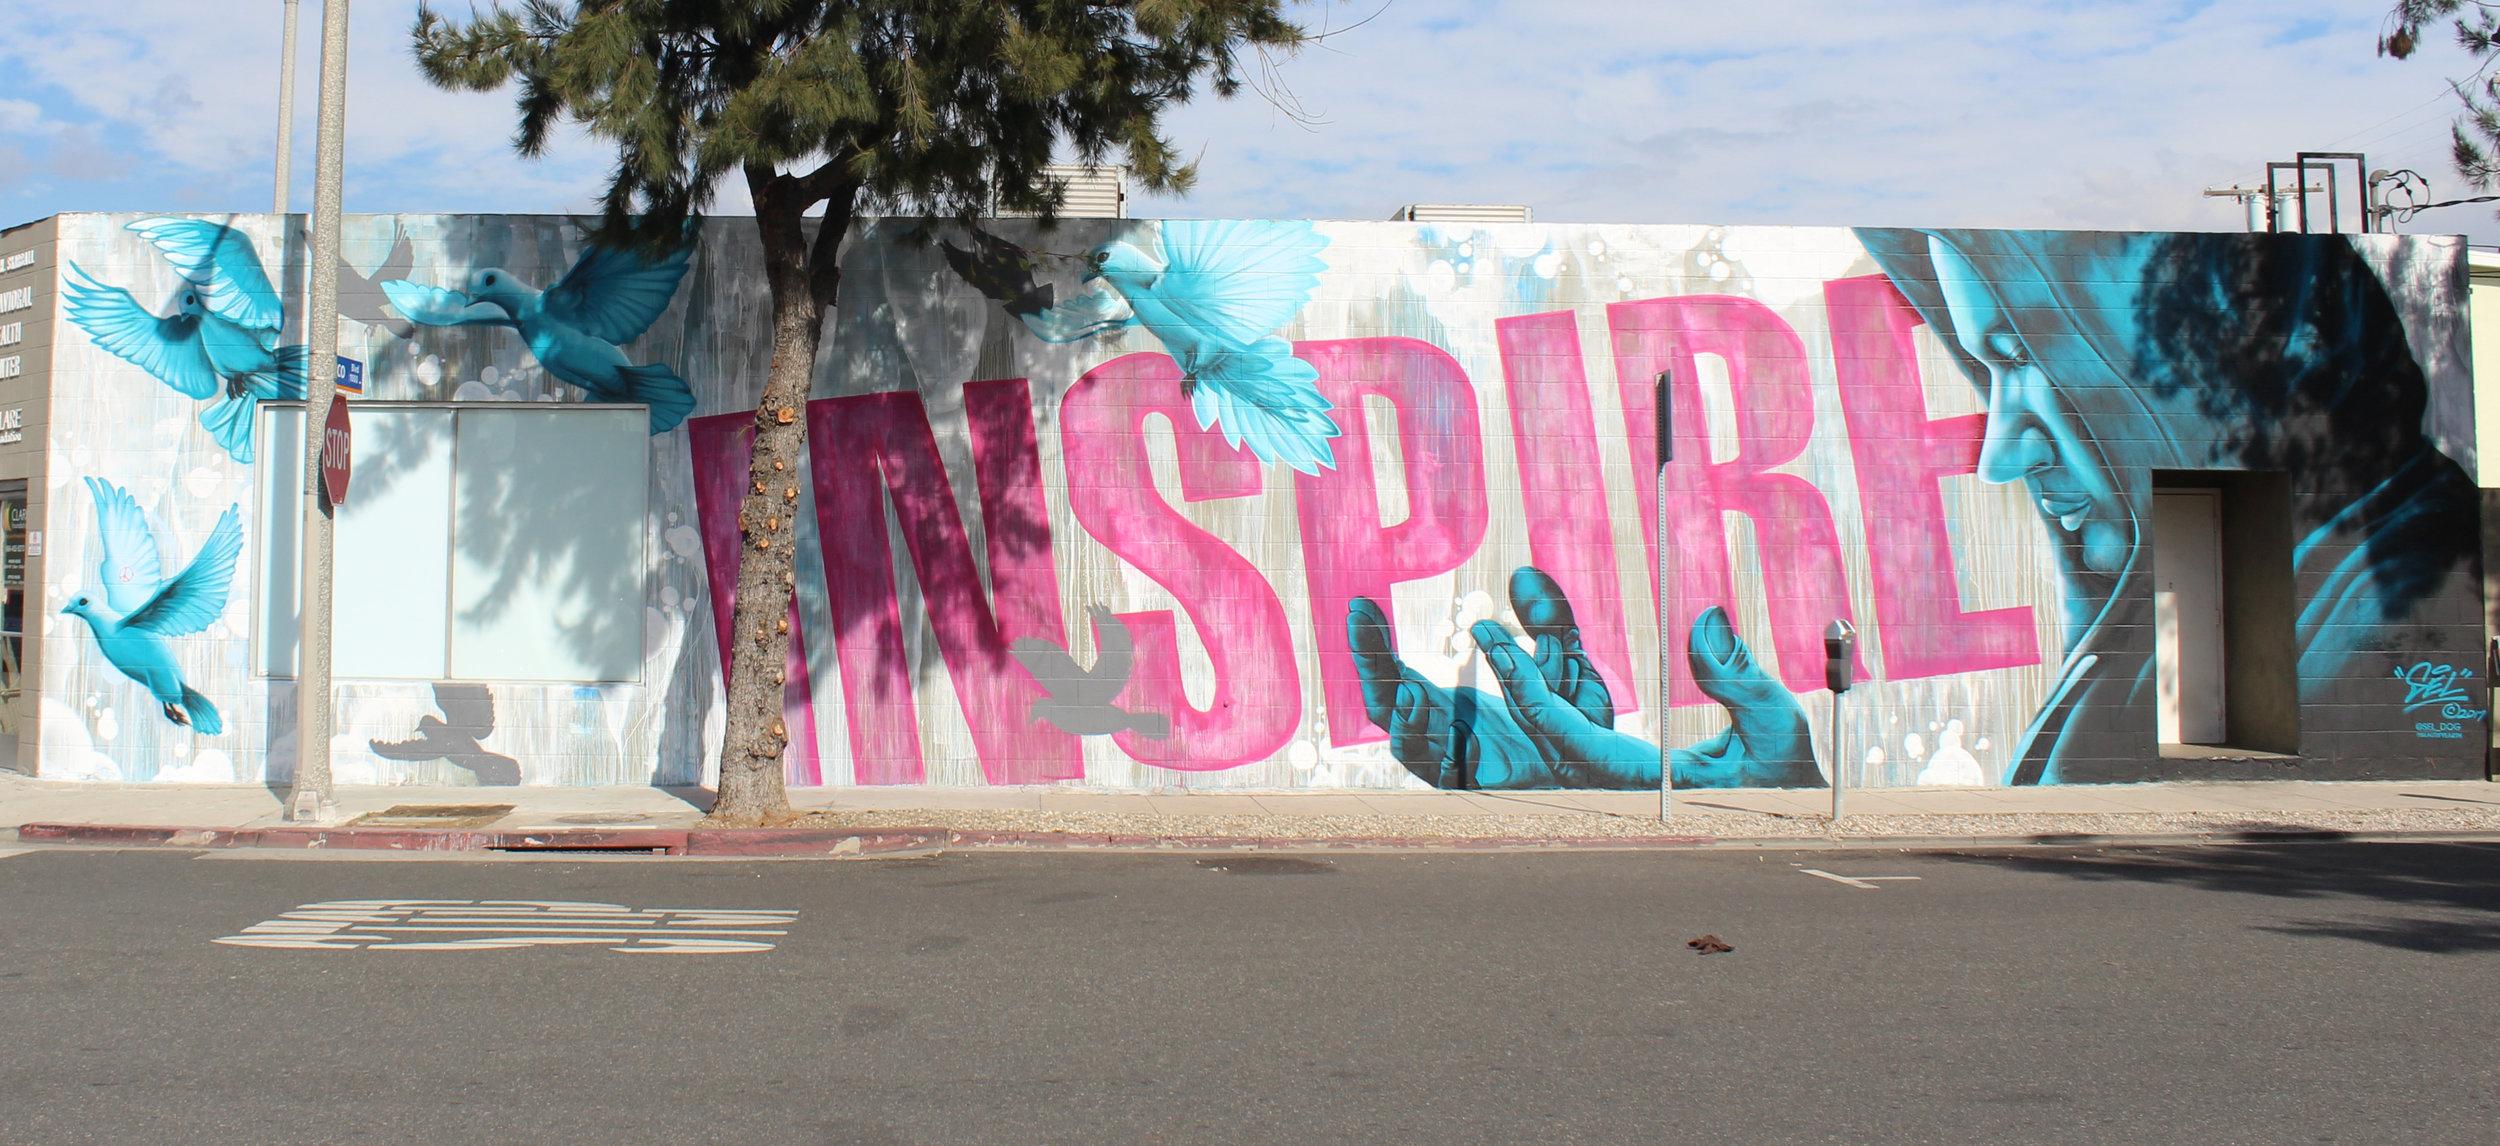 Murals on Pico Blvd show their vibrance in Santa Monica, Calif.